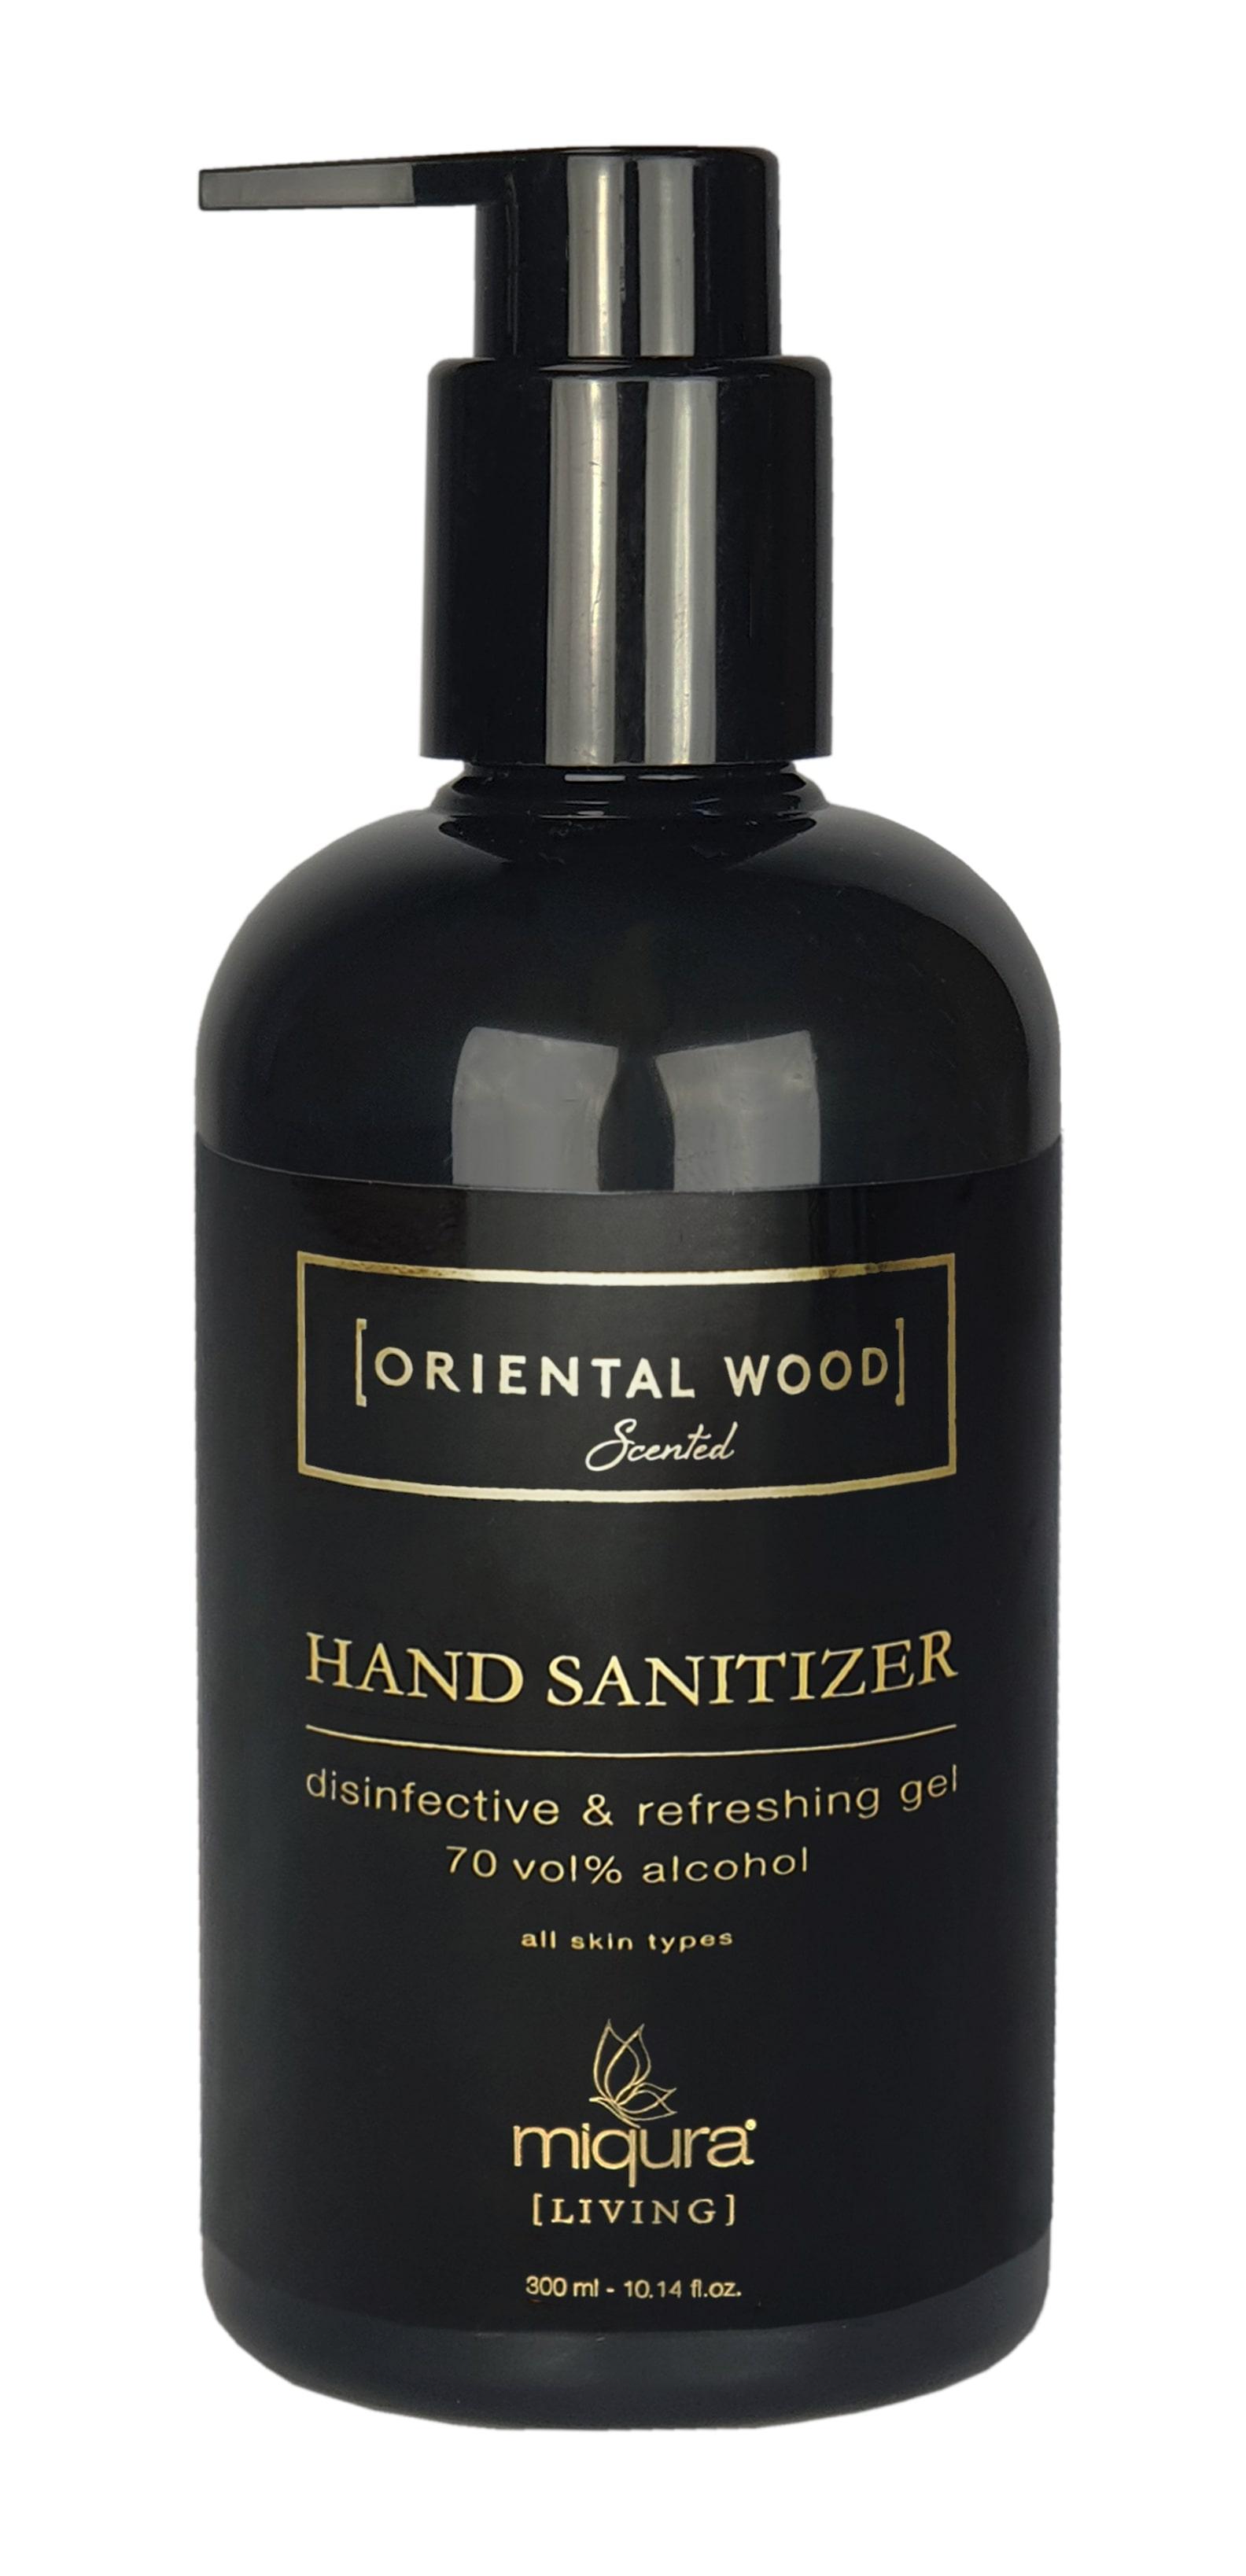 Miqura Living Oriental Wood Hand Sanitizer, 300 ml